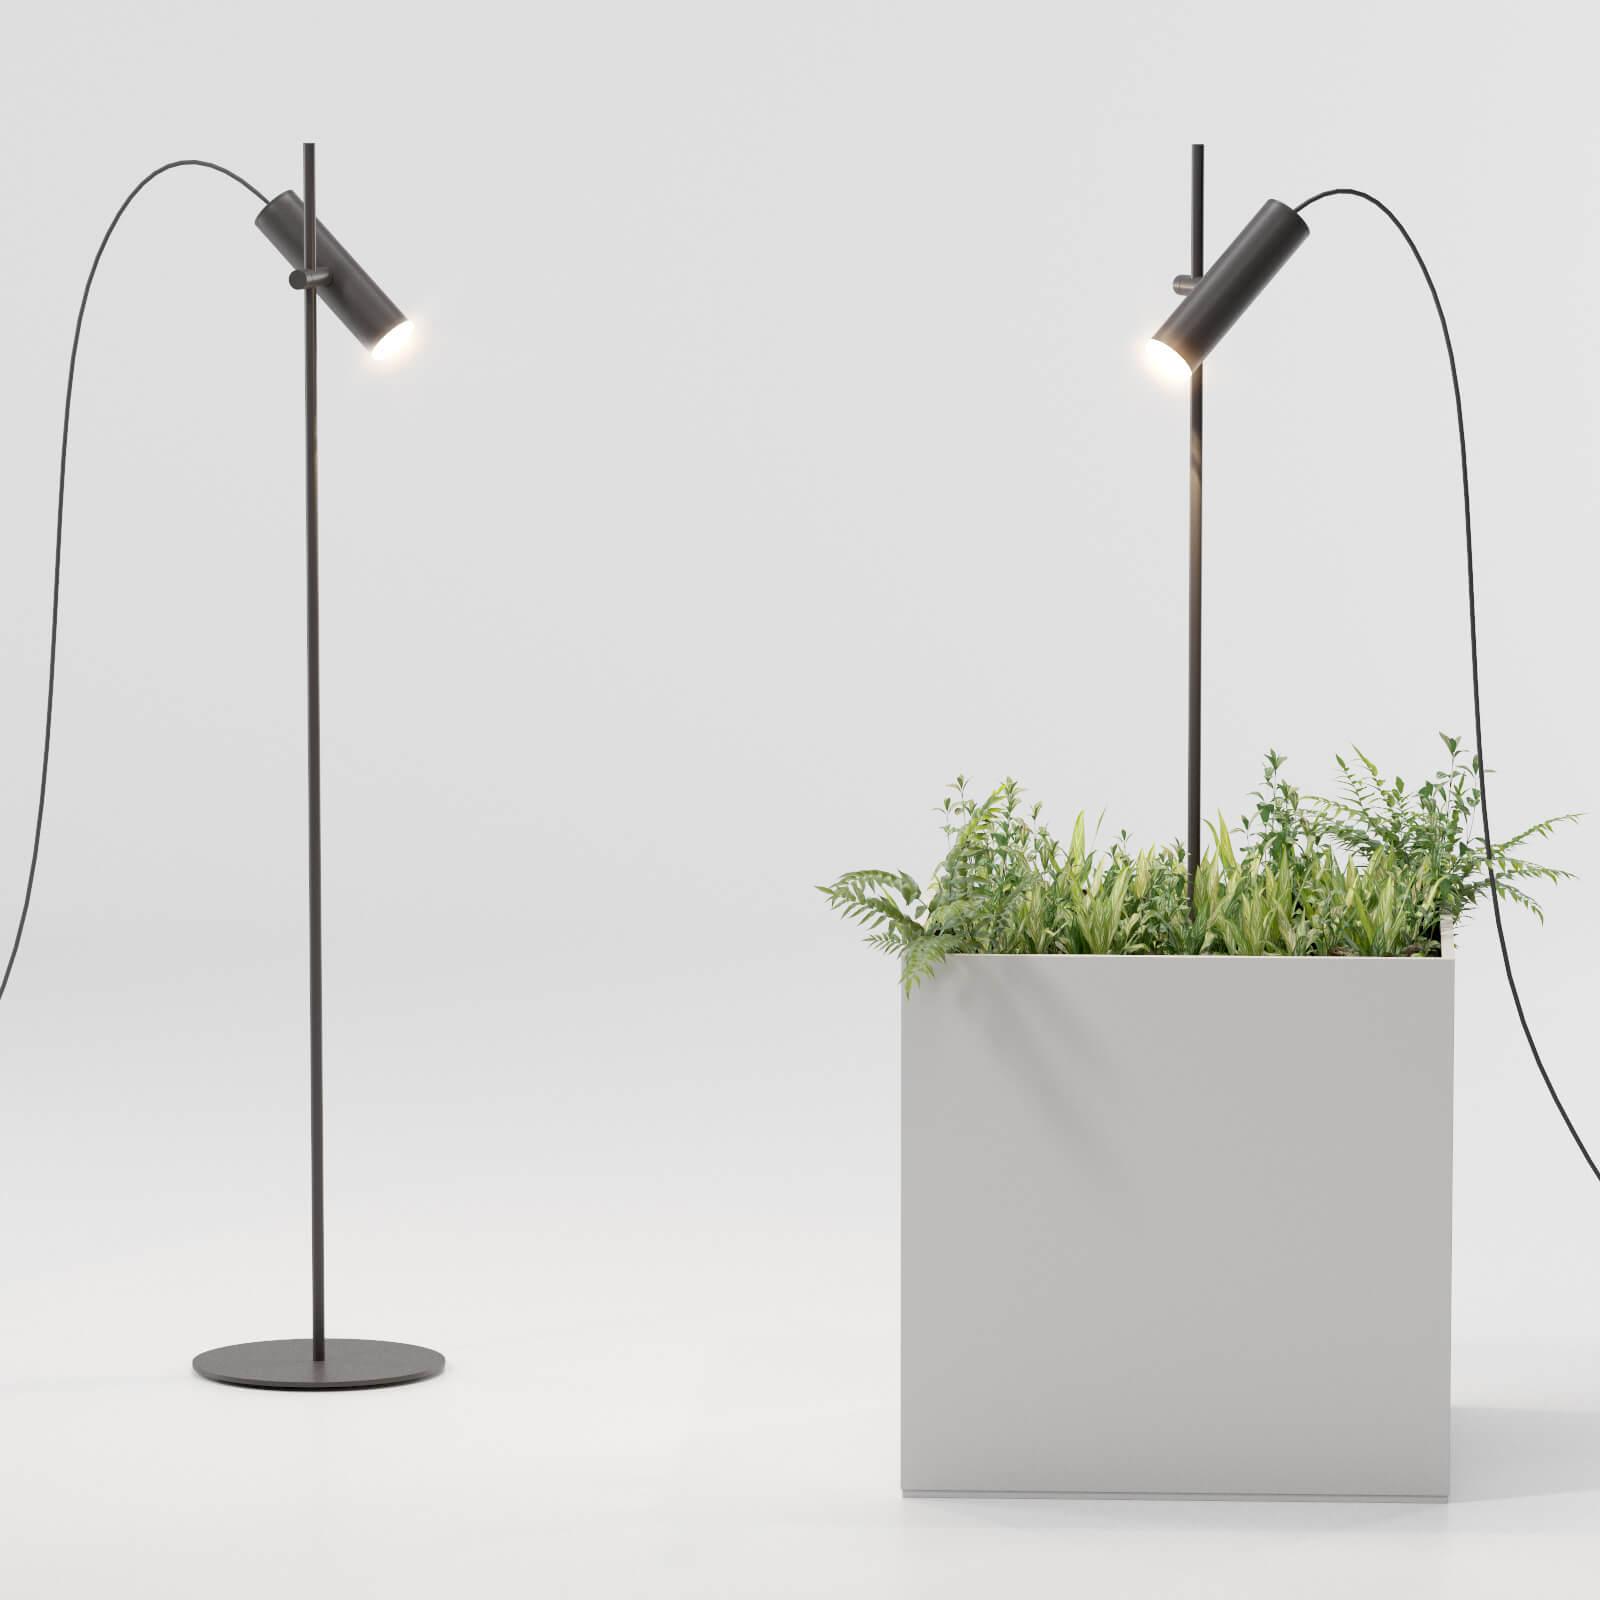 1599_0_Dots_bollard_planter_lamp__2SQ.jpg